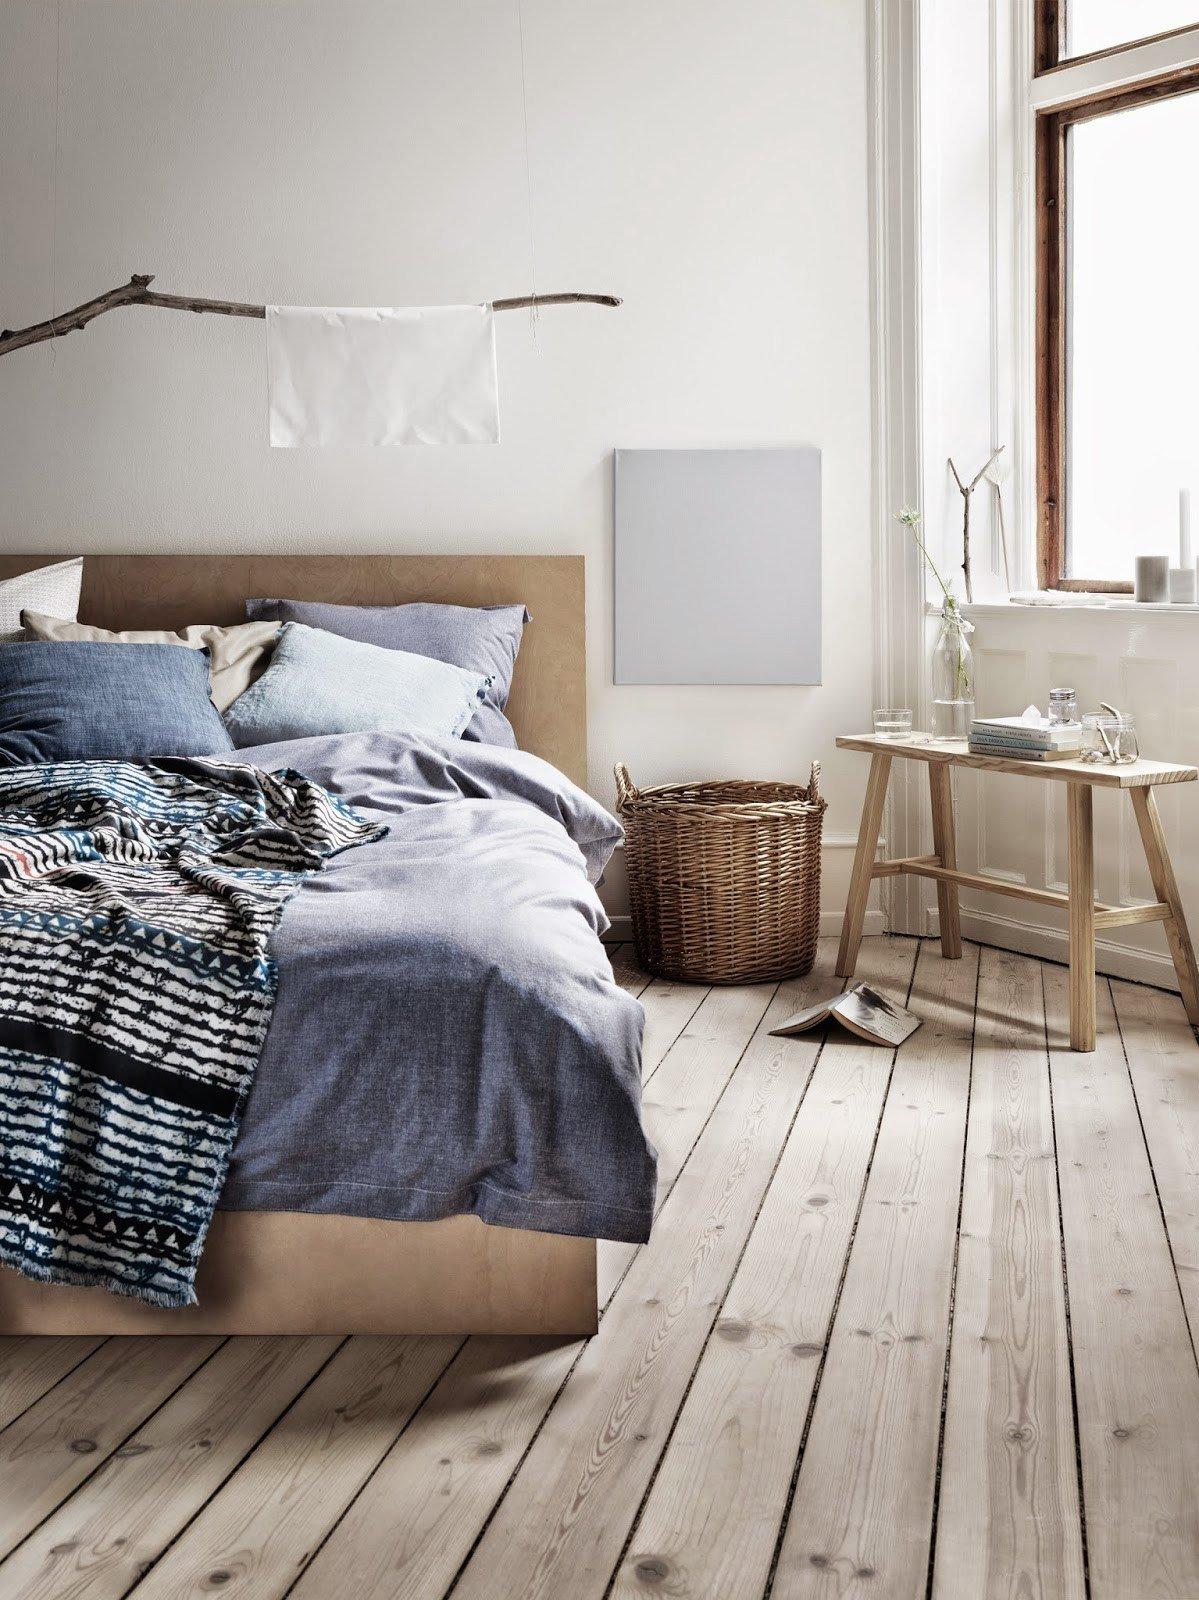 40 Minimalist Bedroom Ideas | Less is More | Homelovr on Bedroom Minimalist Ideas  id=32031